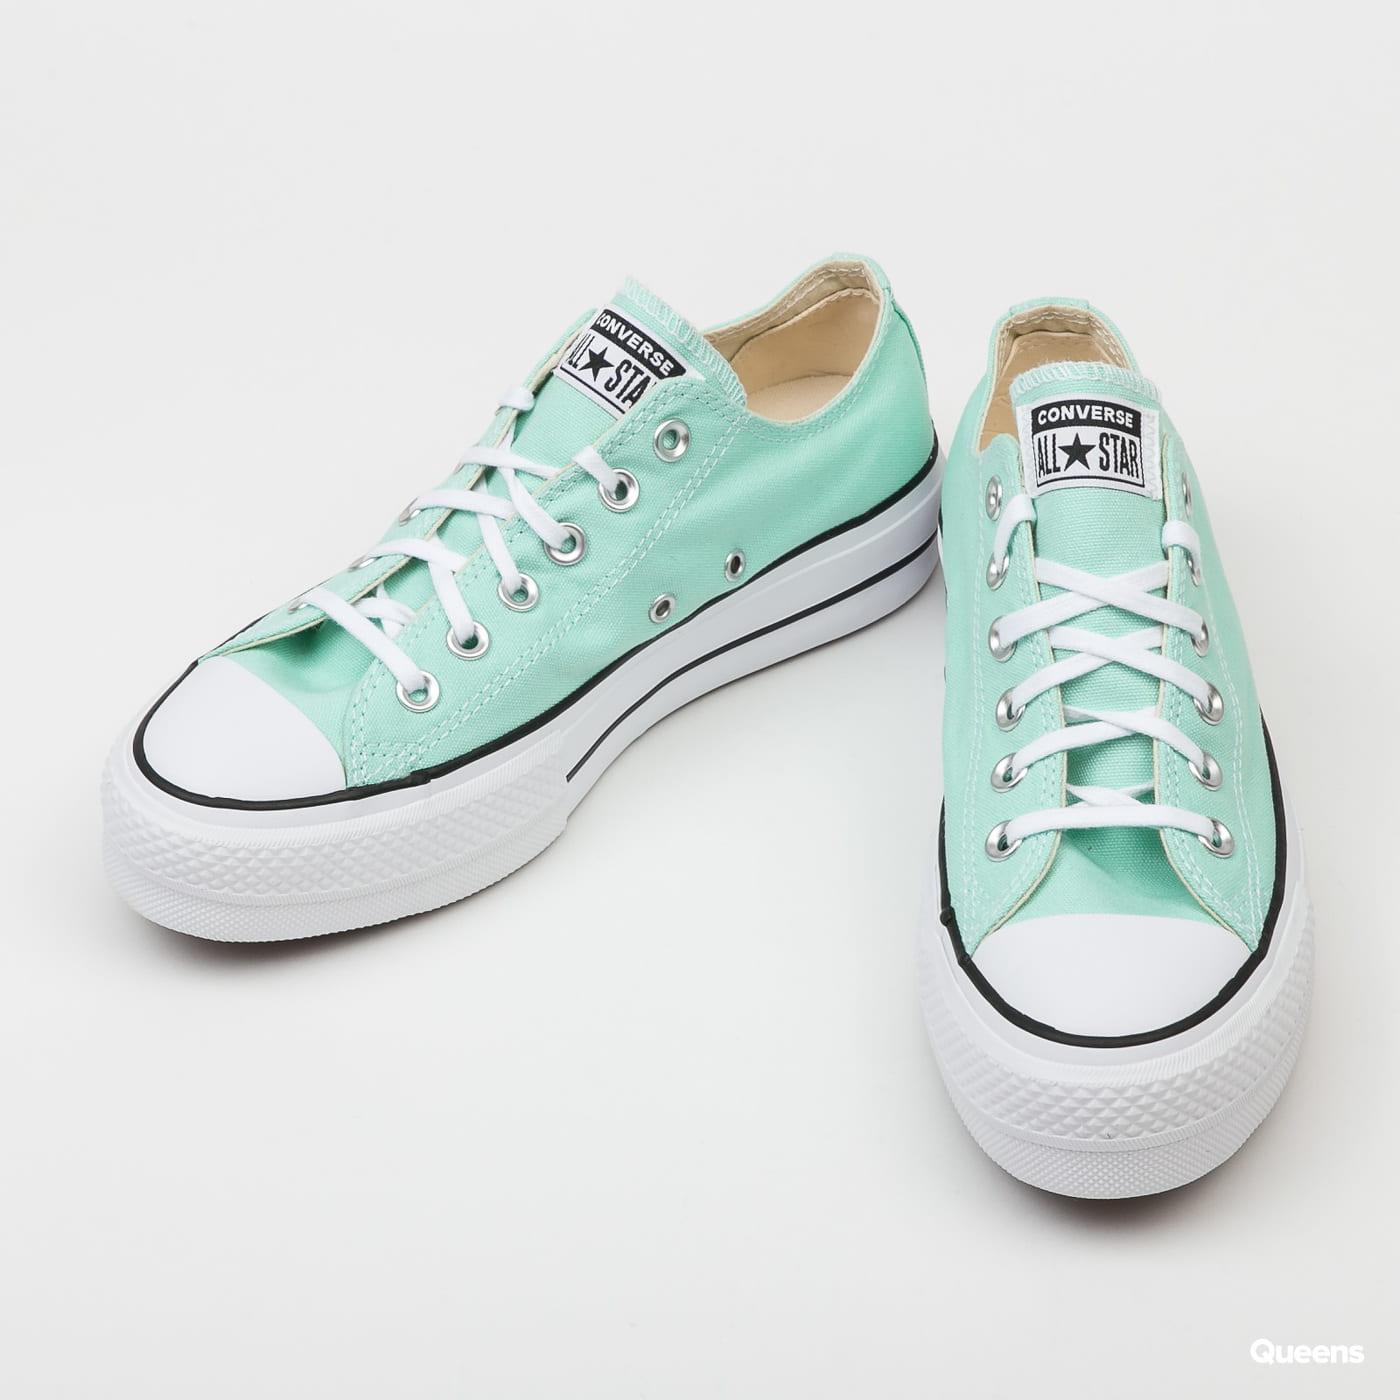 converse mint